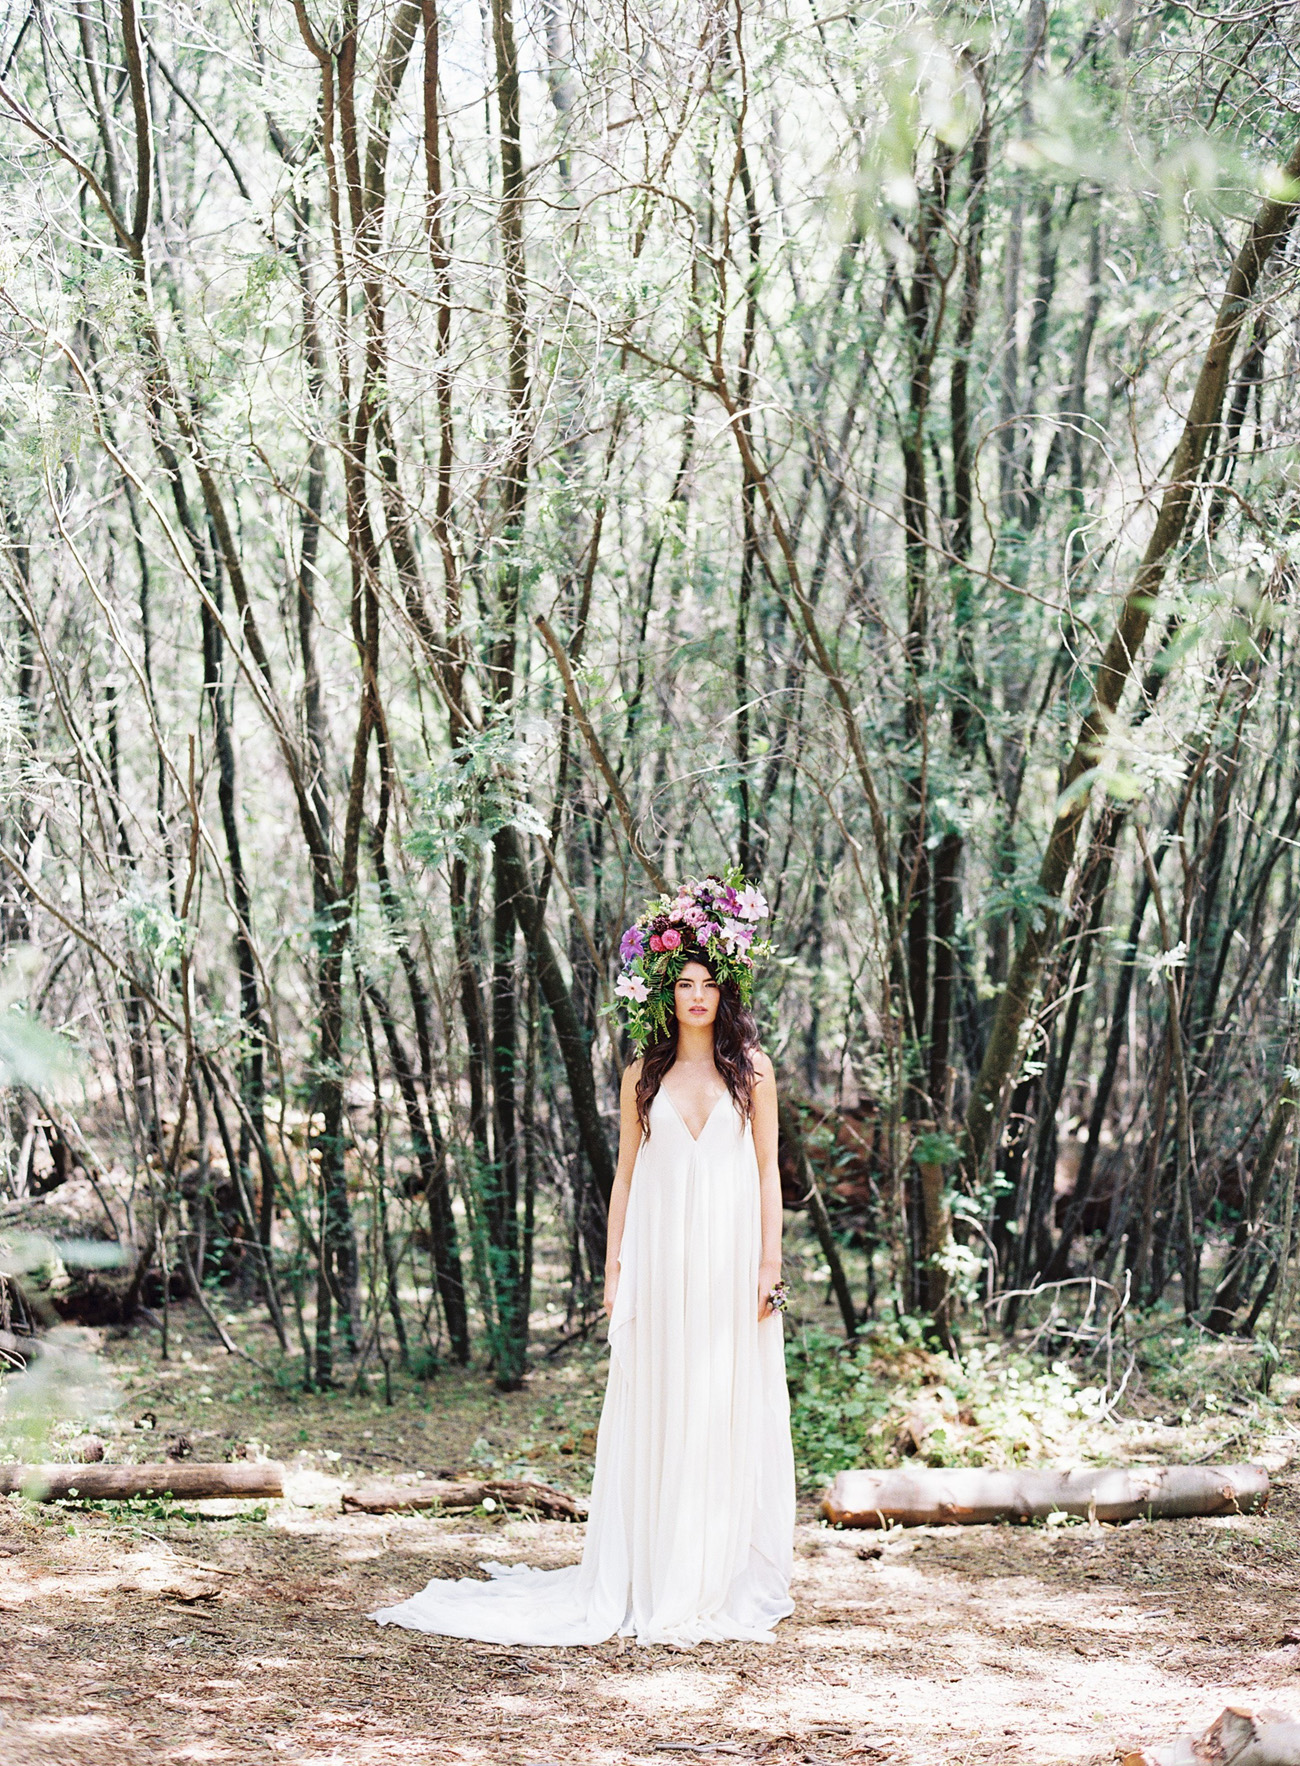 Carol Hannah Bridal Celestine Gown Woodland_LynetteBoyle-180.jpg